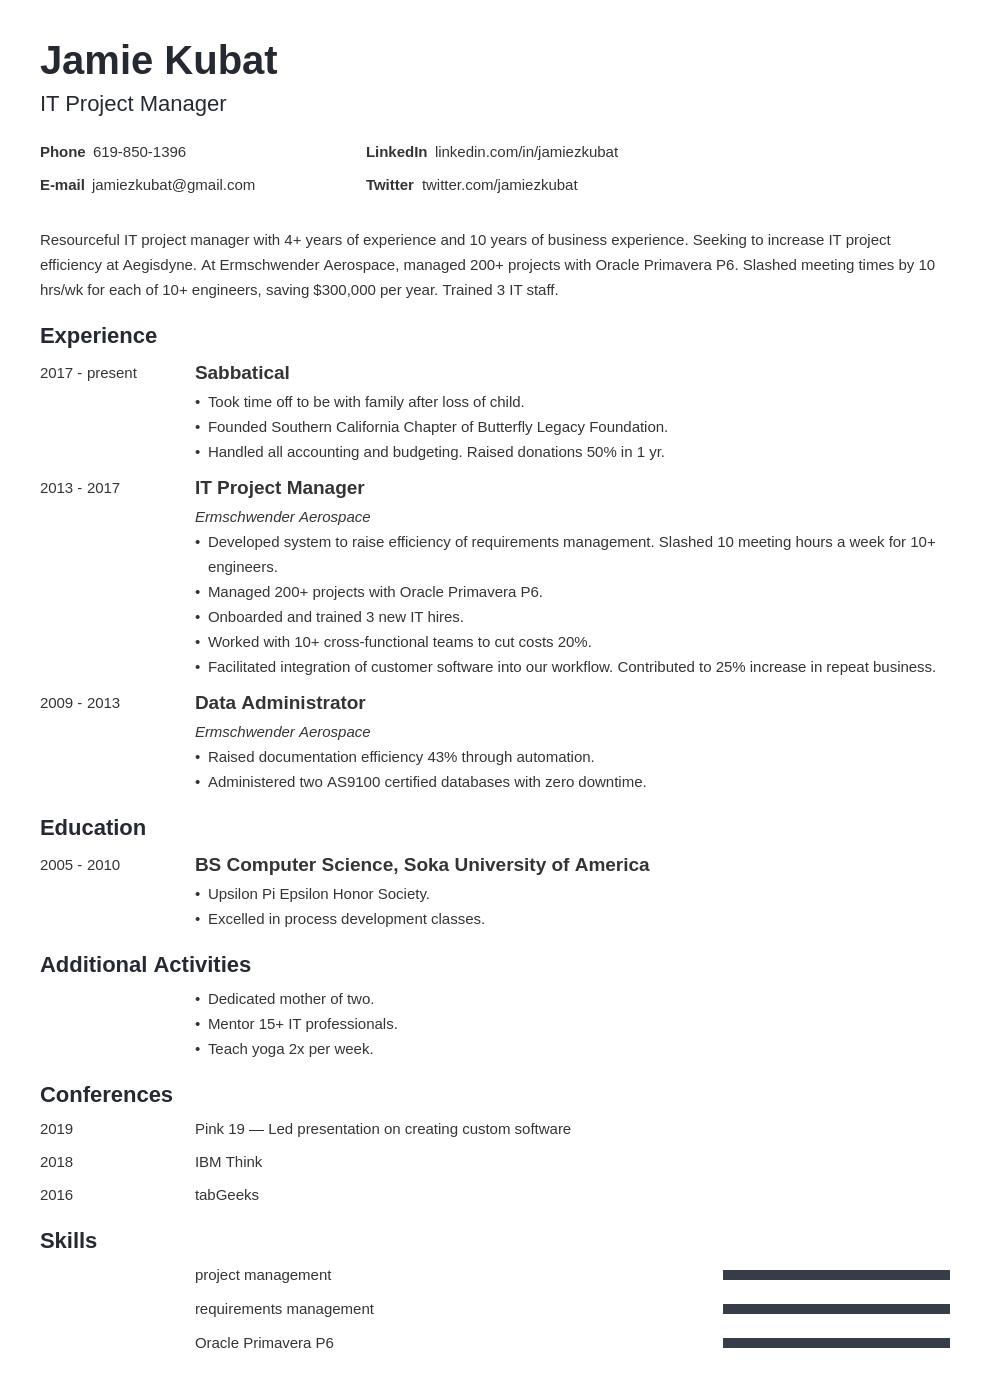 resume employment gaps template minimo